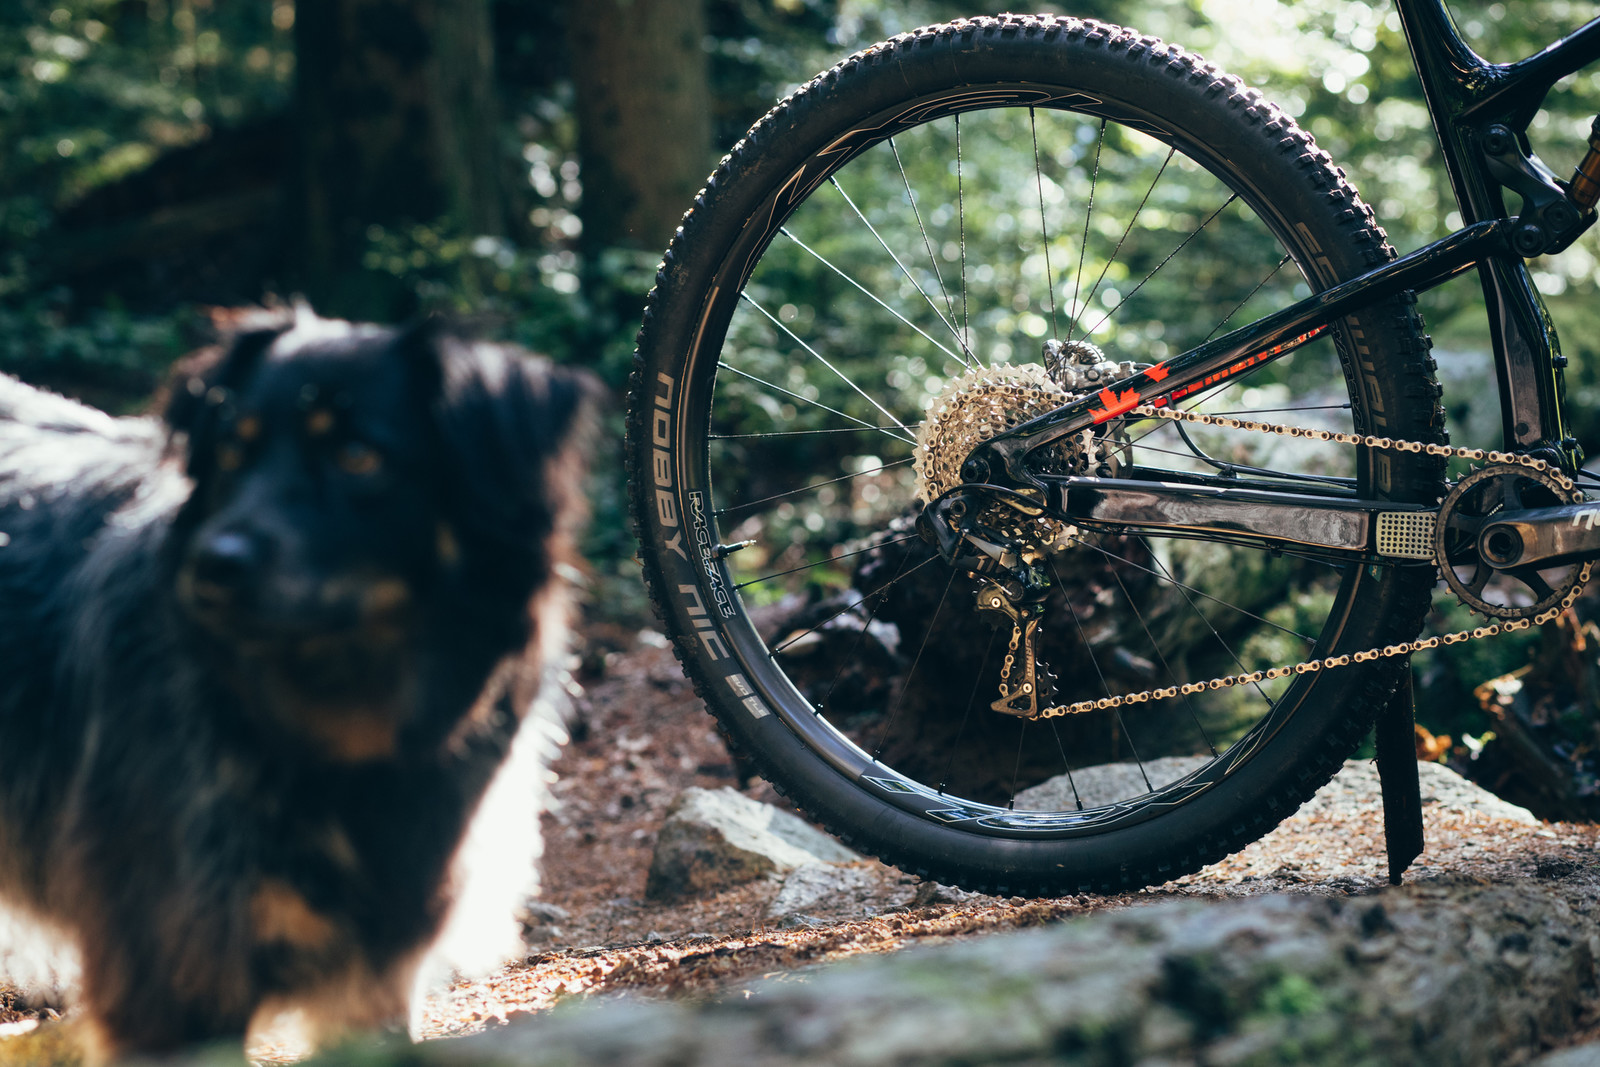 1550g, 29-inch Diameter and 26mm Internal Width - Race Face Next SL Carbon Wheels